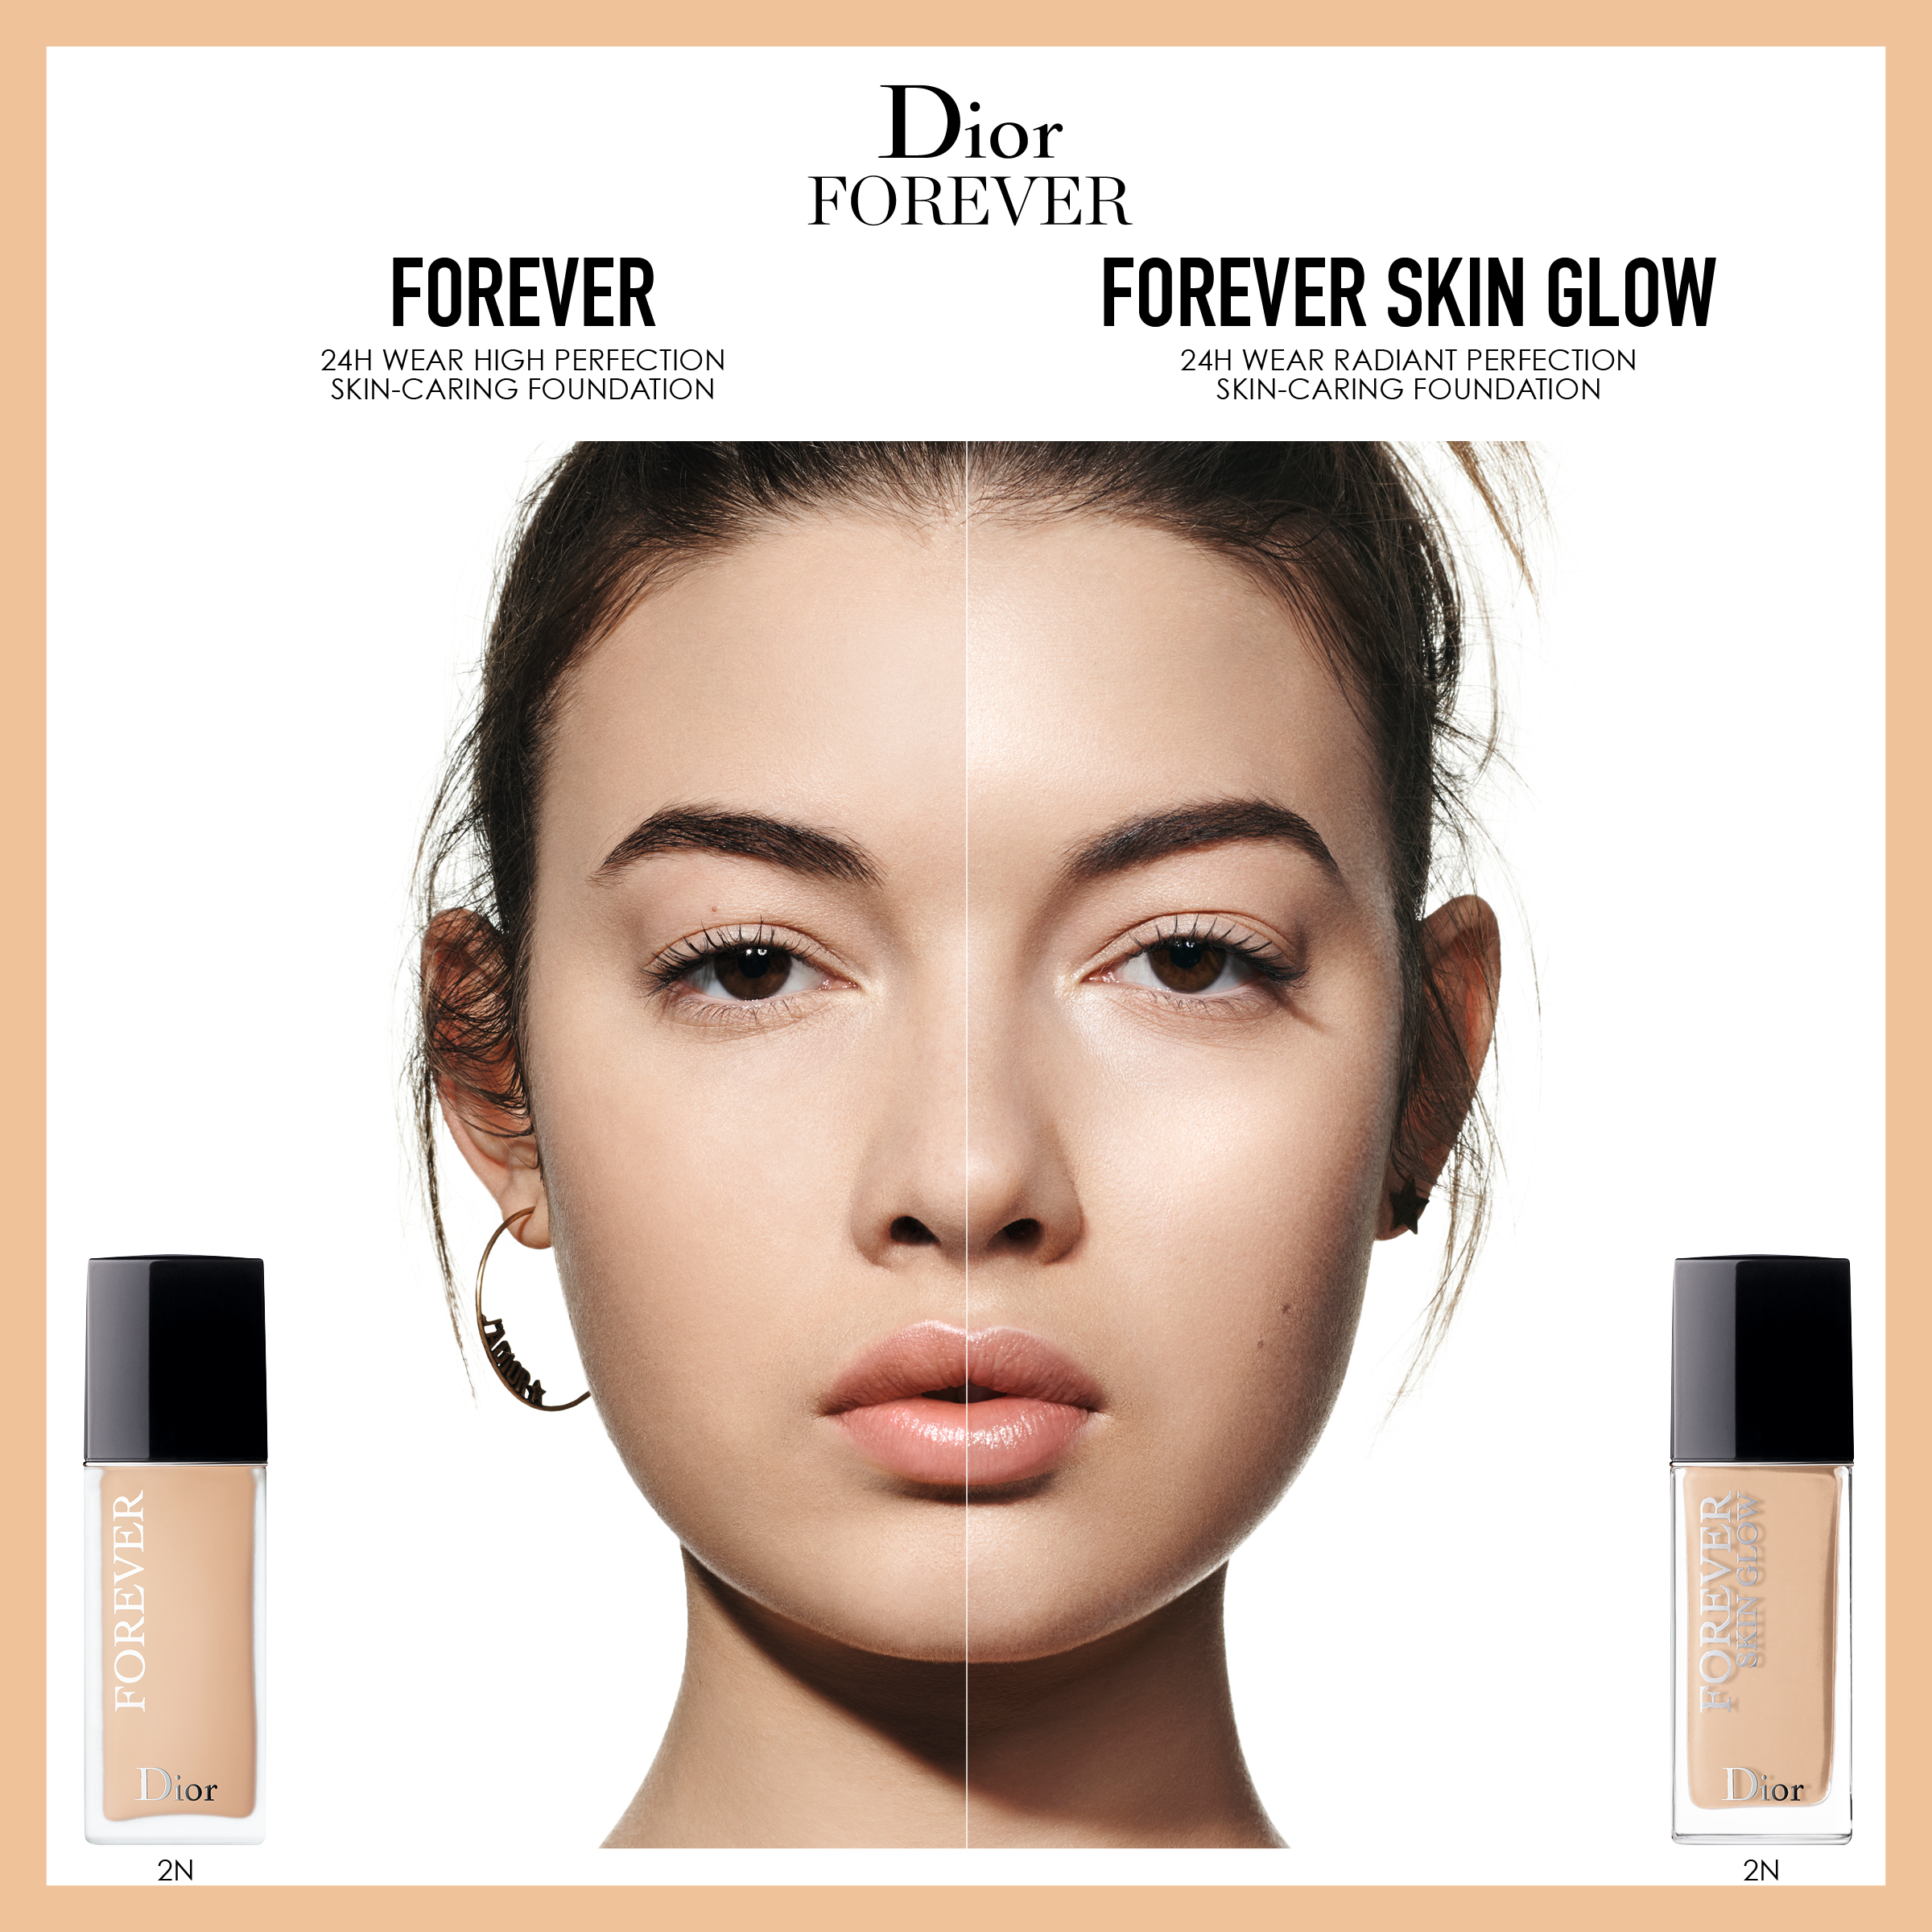 DIOR Forever Fluid Foundation, 5 Neutral